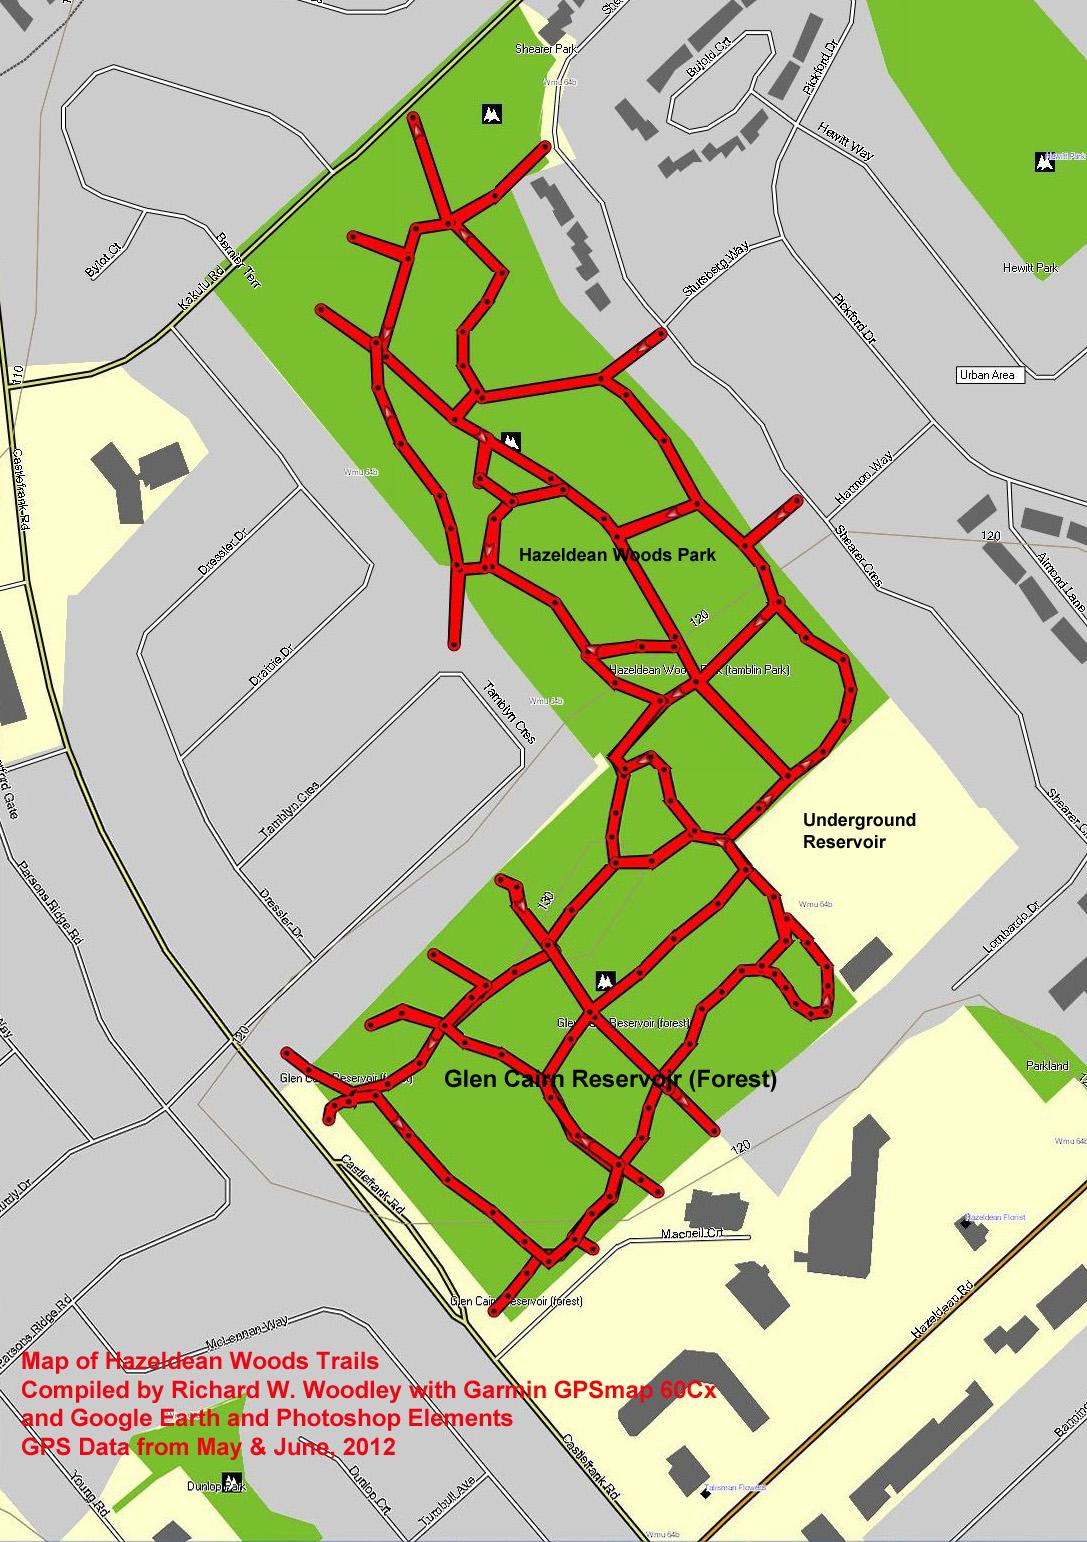 Richards GPS Trail Maps Hazeldean Woods Trails